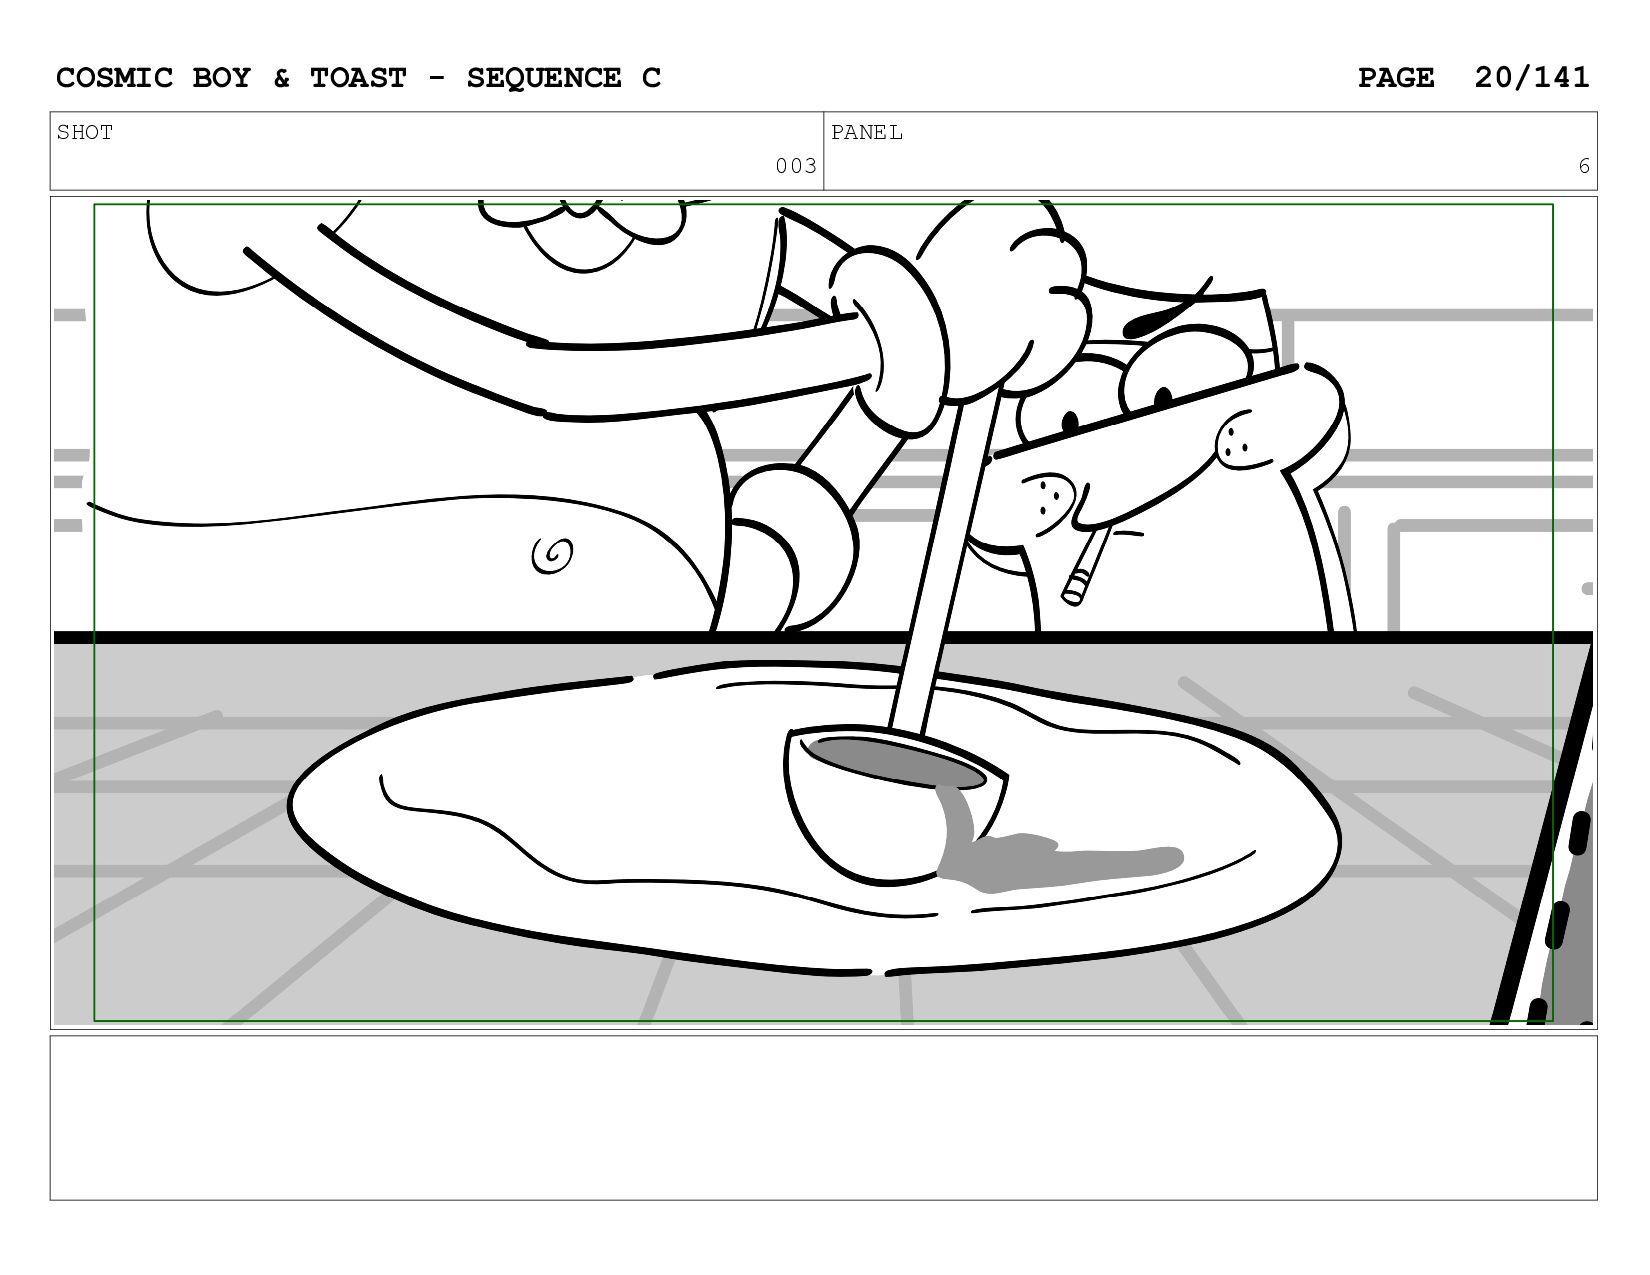 SCENE 003 PANEL F COSMIC BOY & TOAST - SEQUENCE...